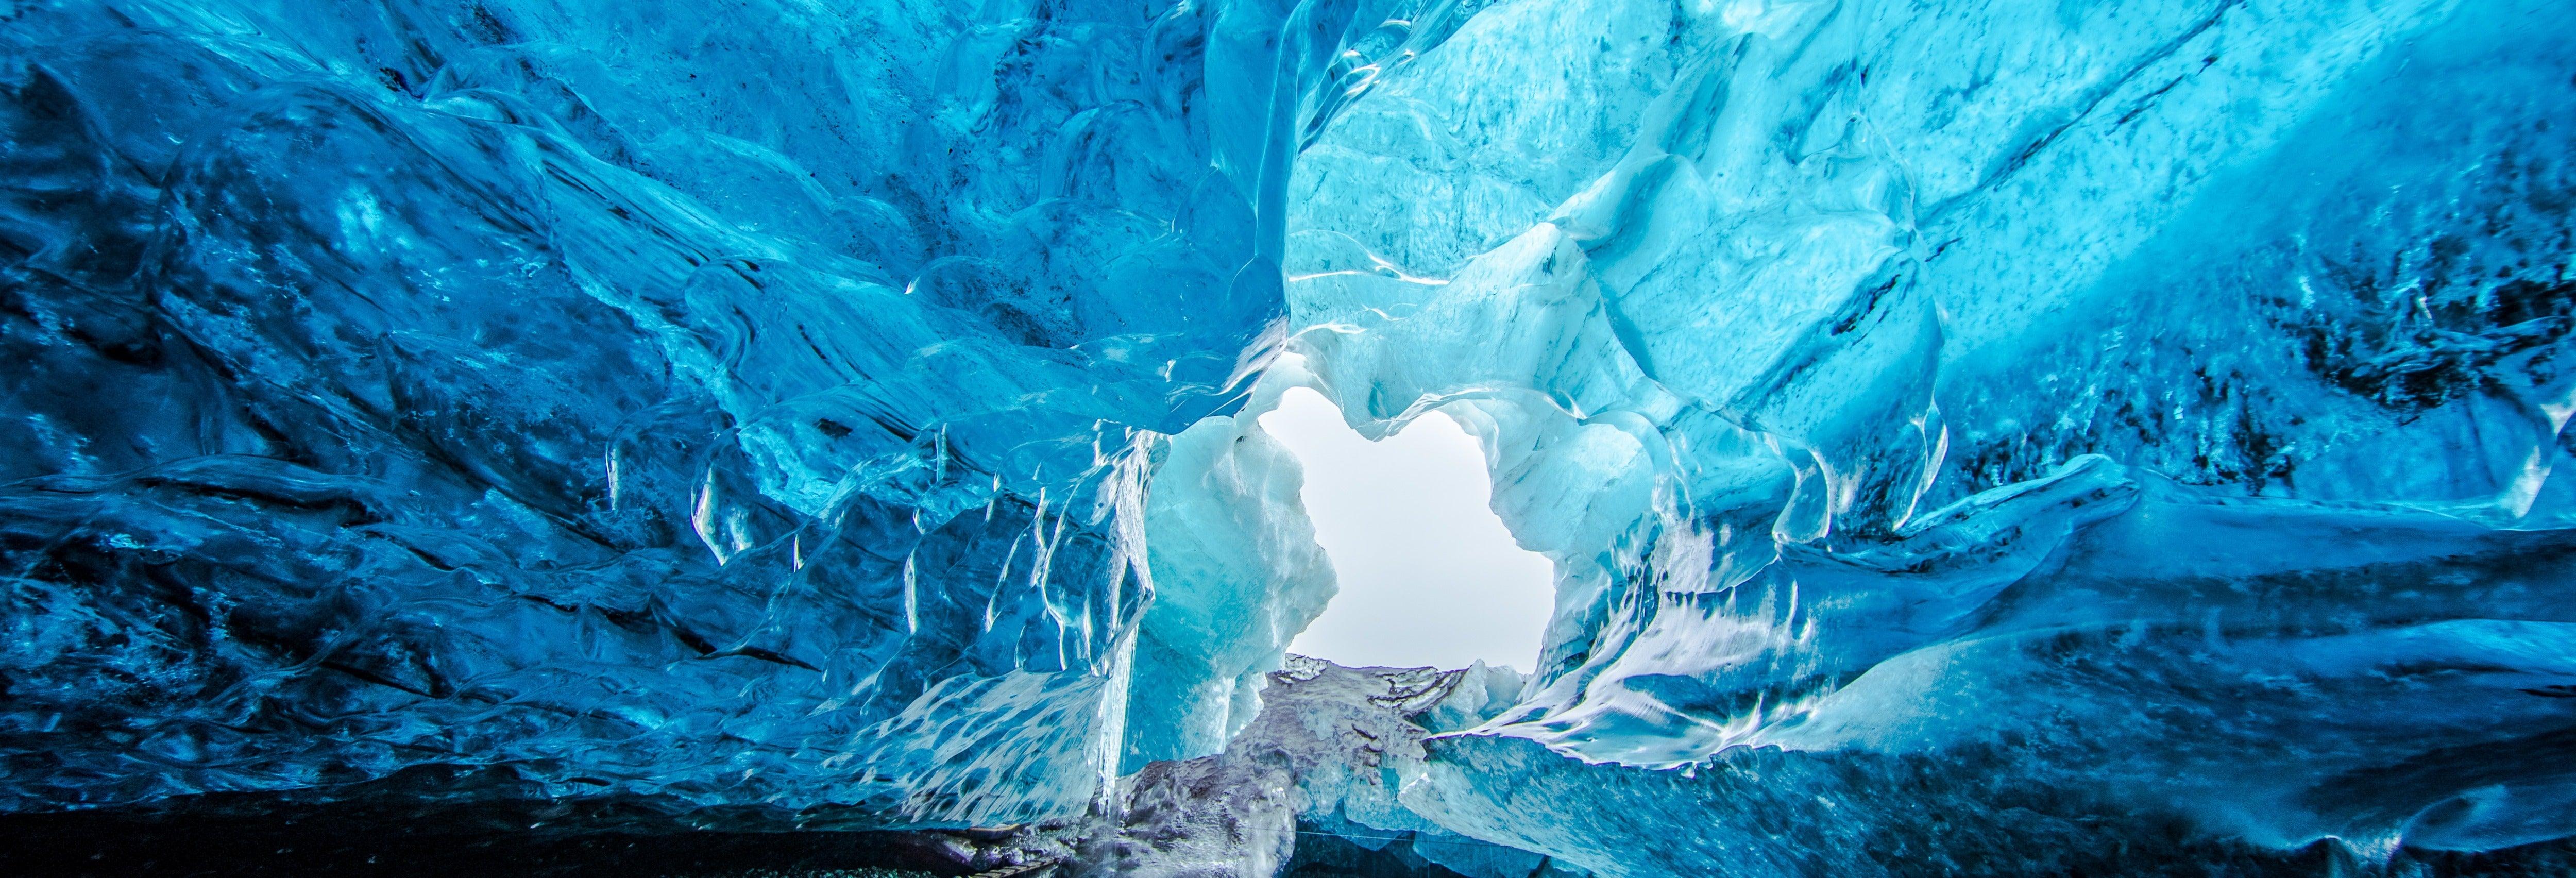 Tour della grotta del ghiacciaio Vatnajökull